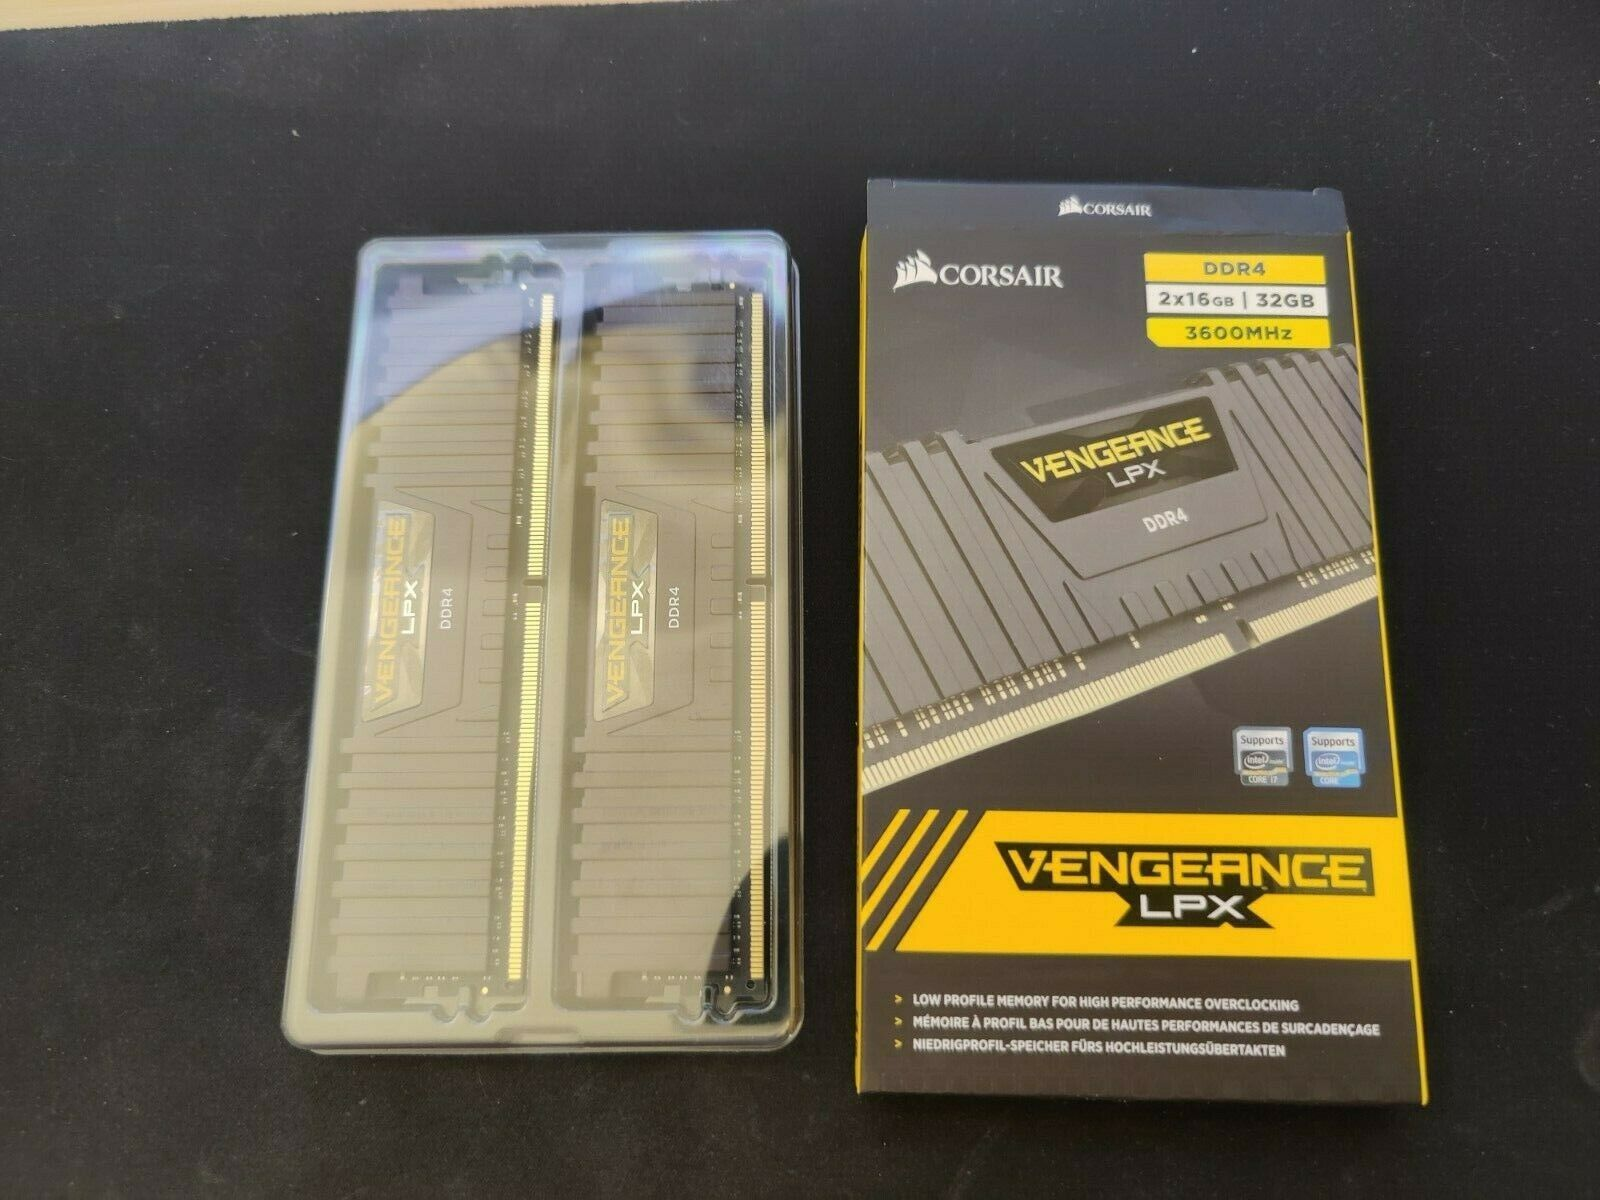 Corsair Vengeance LPX 32GB (2x16GB) DDR4-3600 CMK32GX4M2D3600C18 BARELY USED!. Buy it now for 139.00